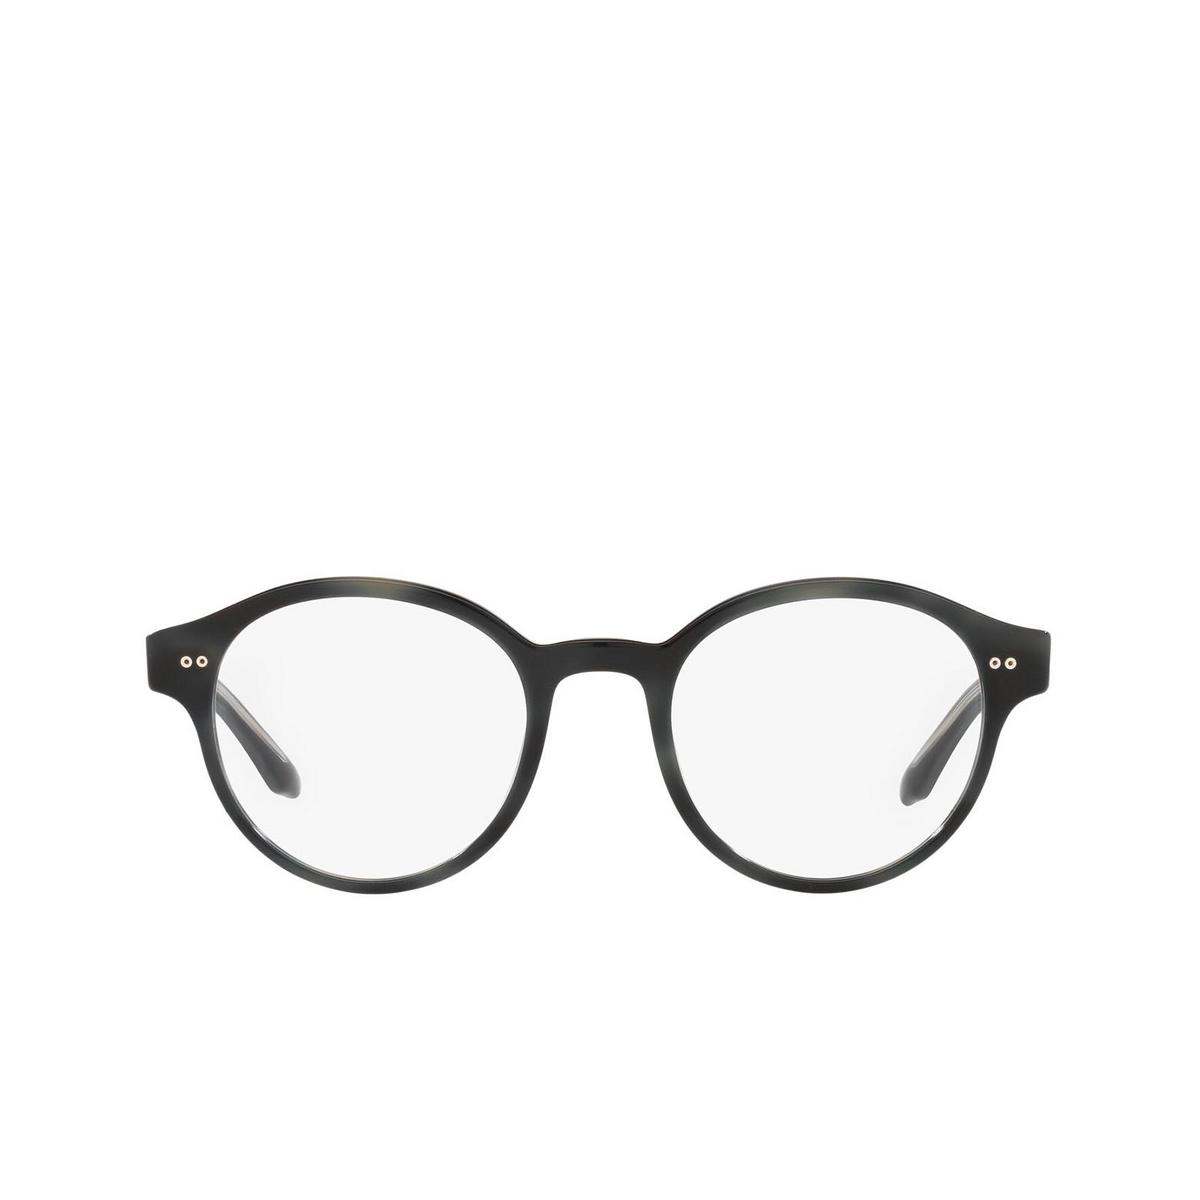 Giorgio Armani® Round Eyeglasses: AR7196 color Black 5001 - front view.